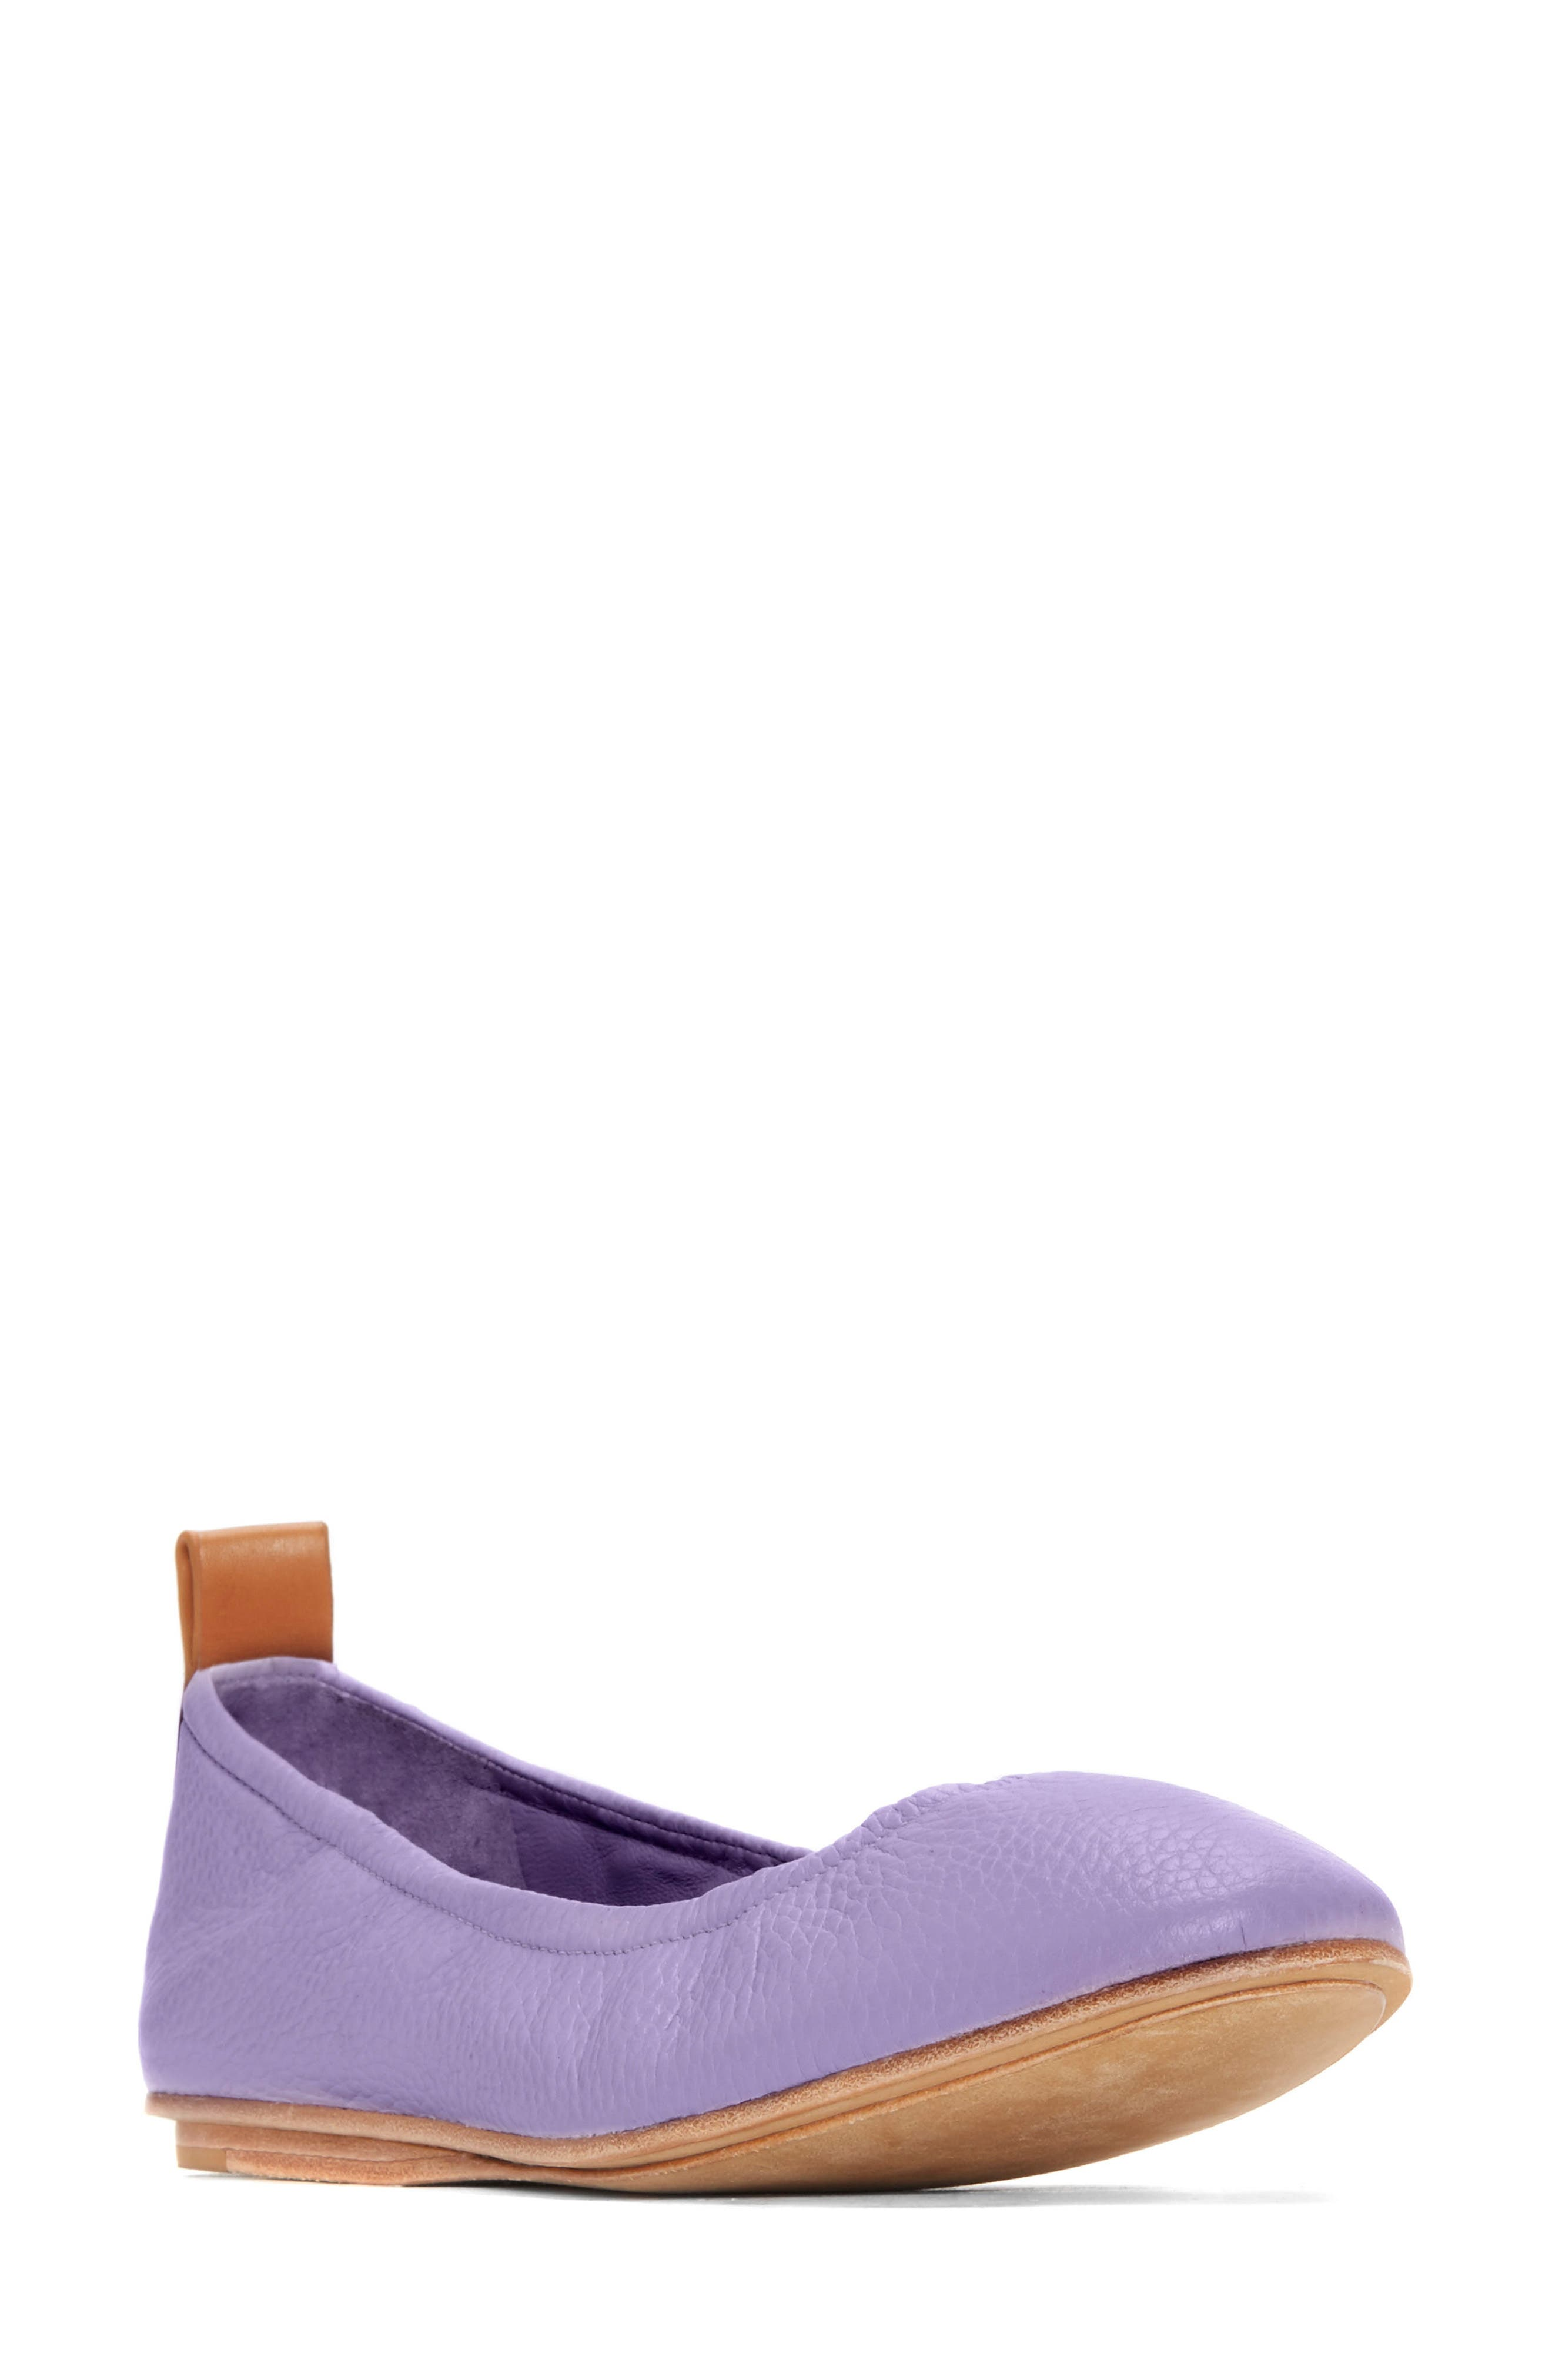 Carola Ballet Flat,                             Main thumbnail 1, color,                             Lavender